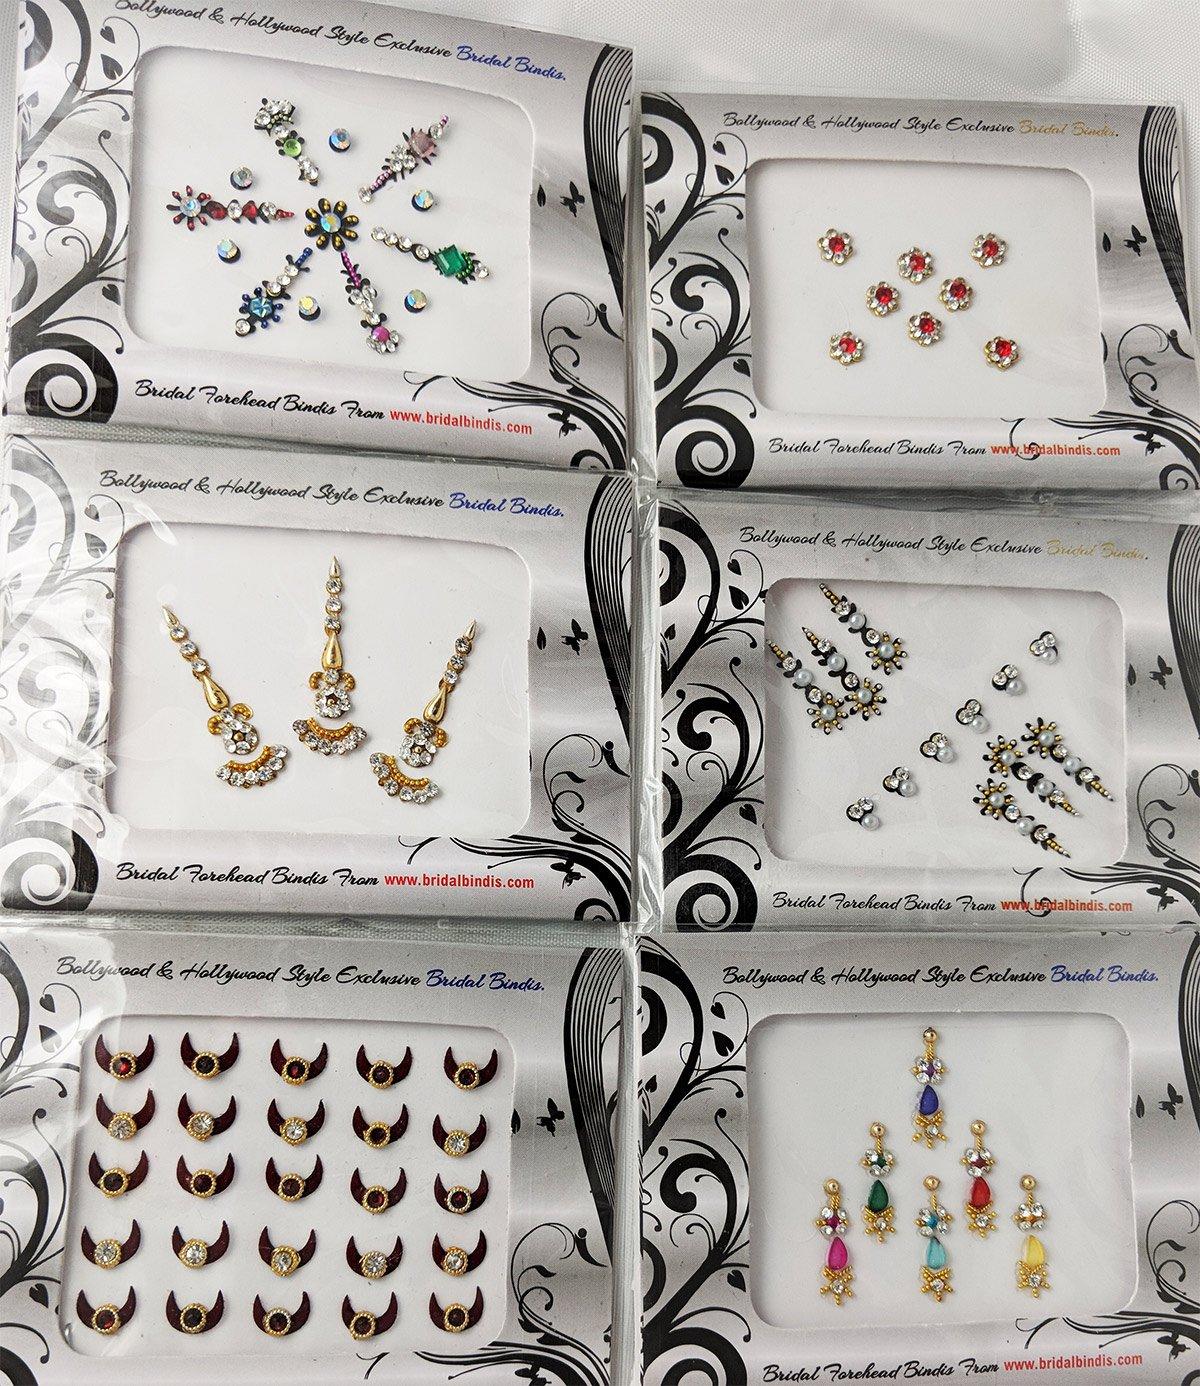 Bindis 6 Pack - 80 Multi-colored Assorted Bollywood Head Bindi Indian Forehead Jewel Stickers all sized & shape Tattoo Mega Deal.